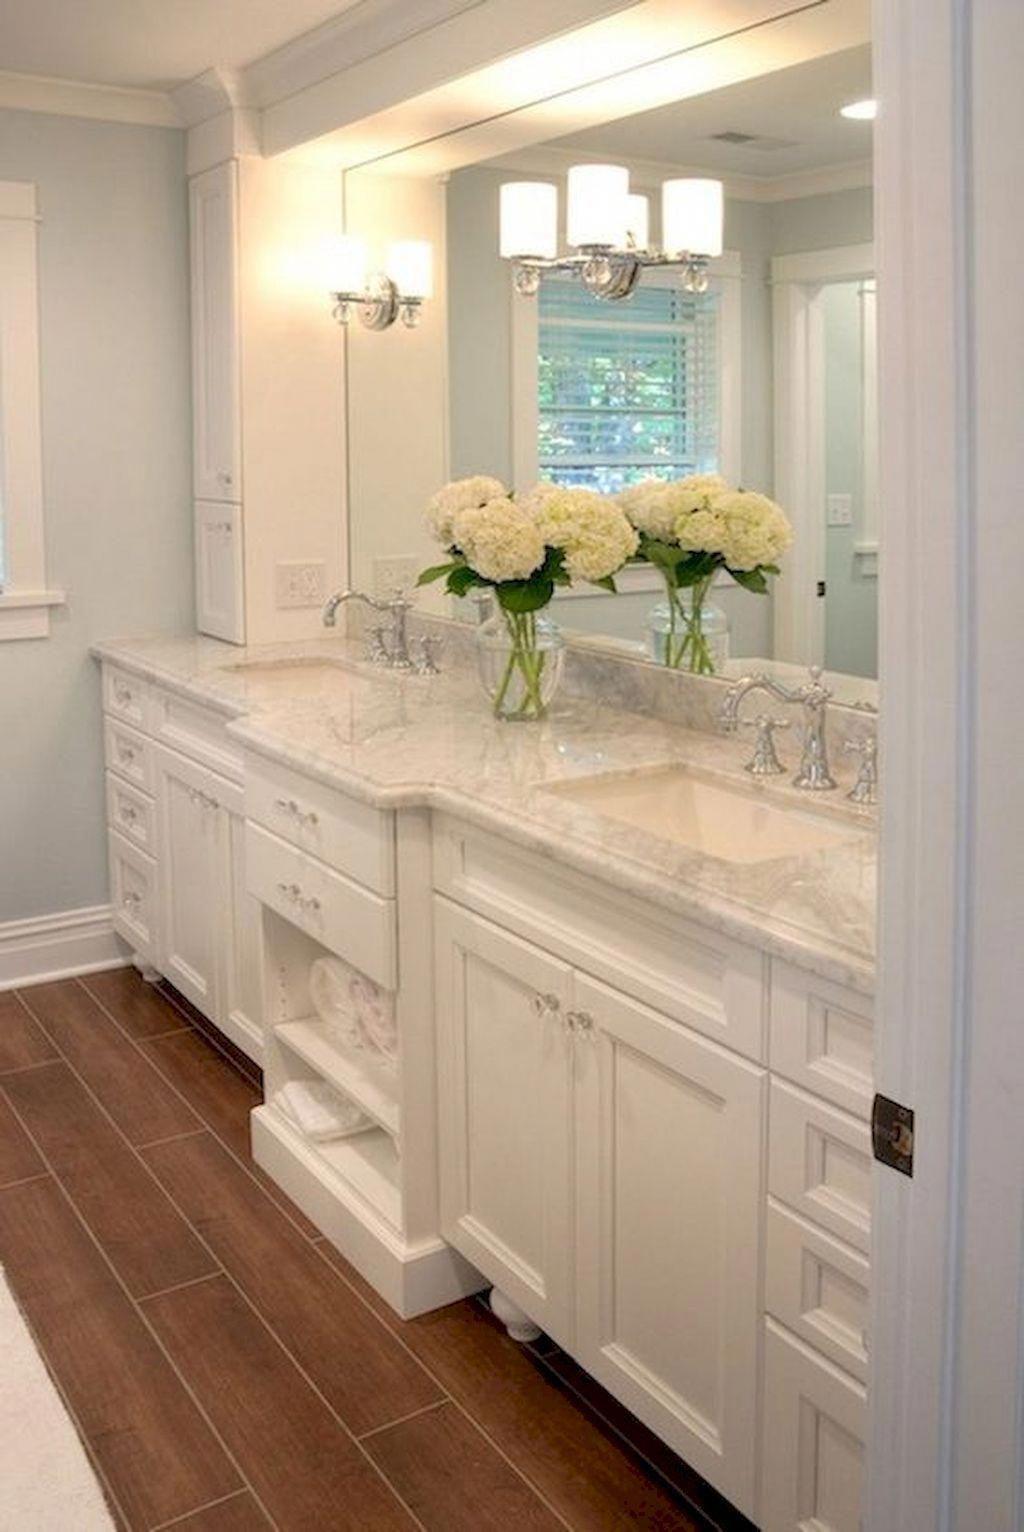 . Pioneering umpired bathroom remodel sites   Easy Home Decor in 2019